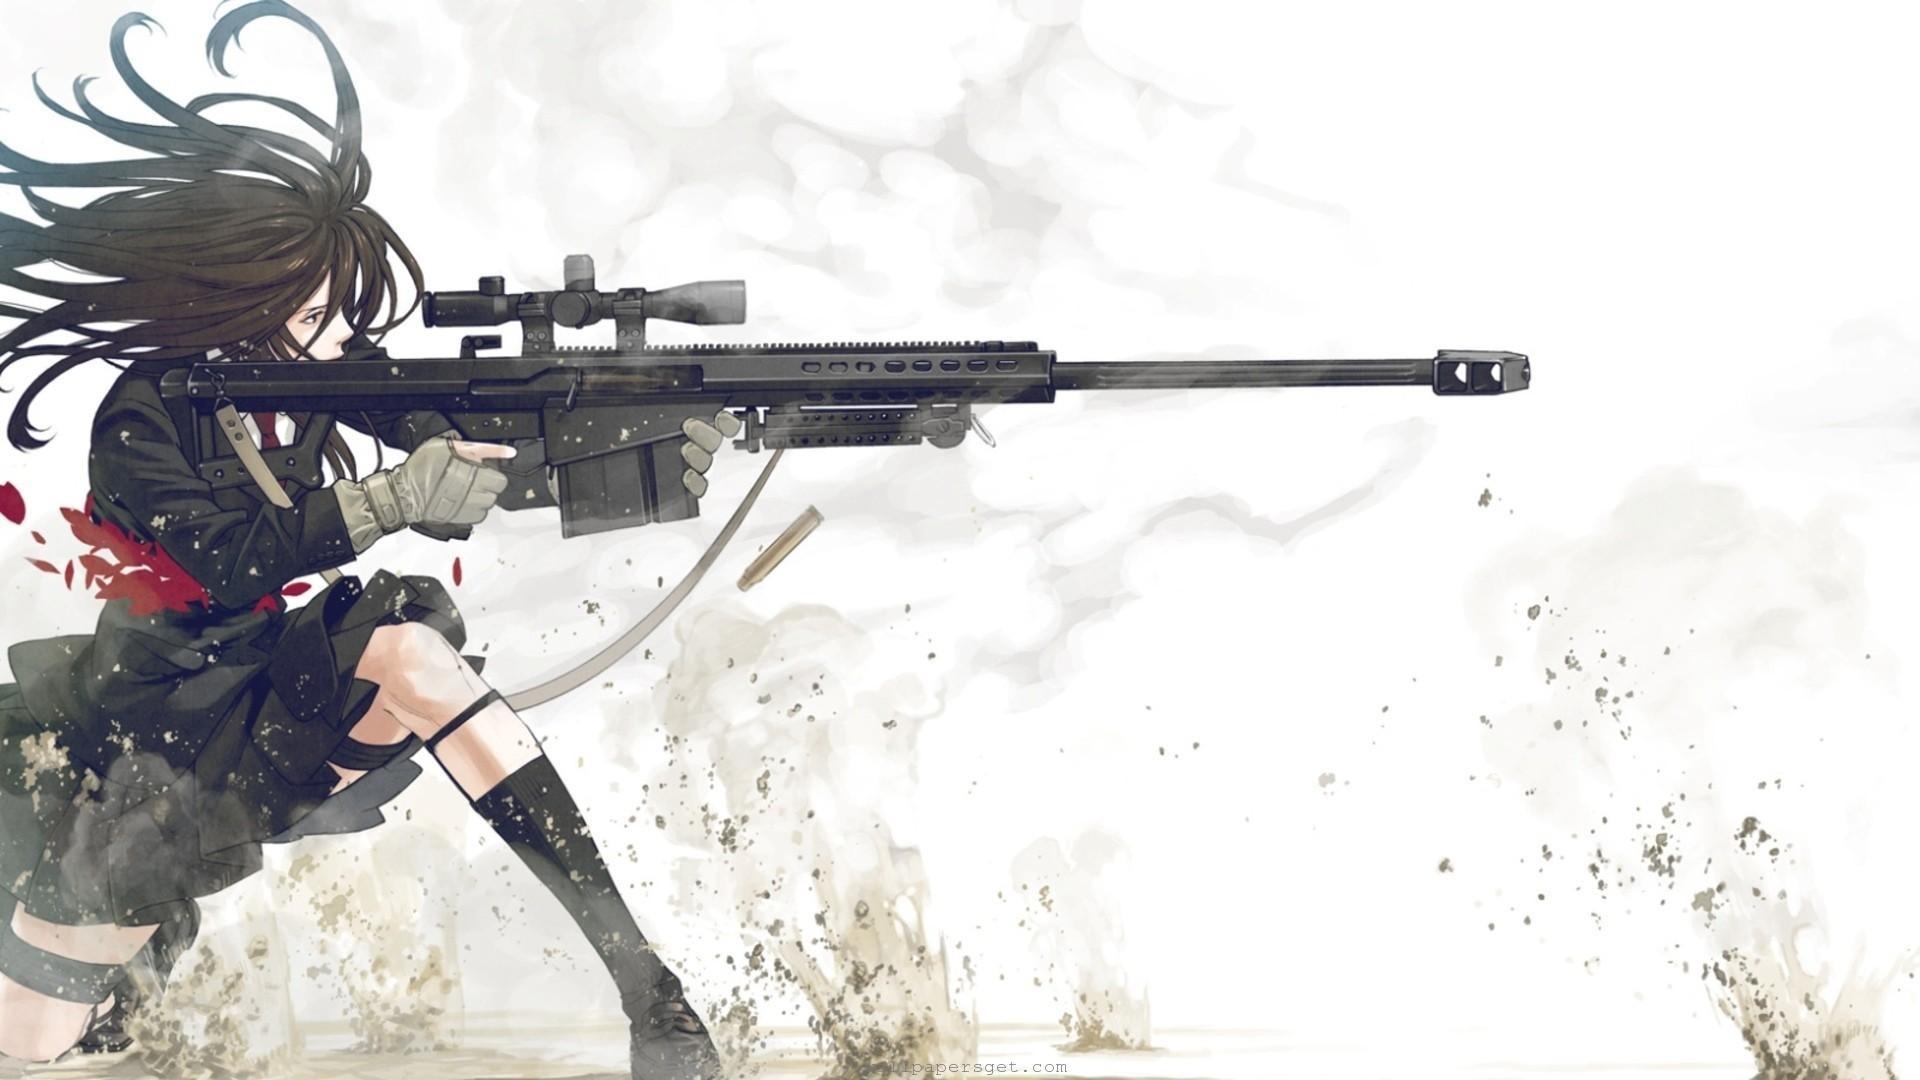 Anime Gun Wallpaper Hd Desktop 10 HD Wallpapers